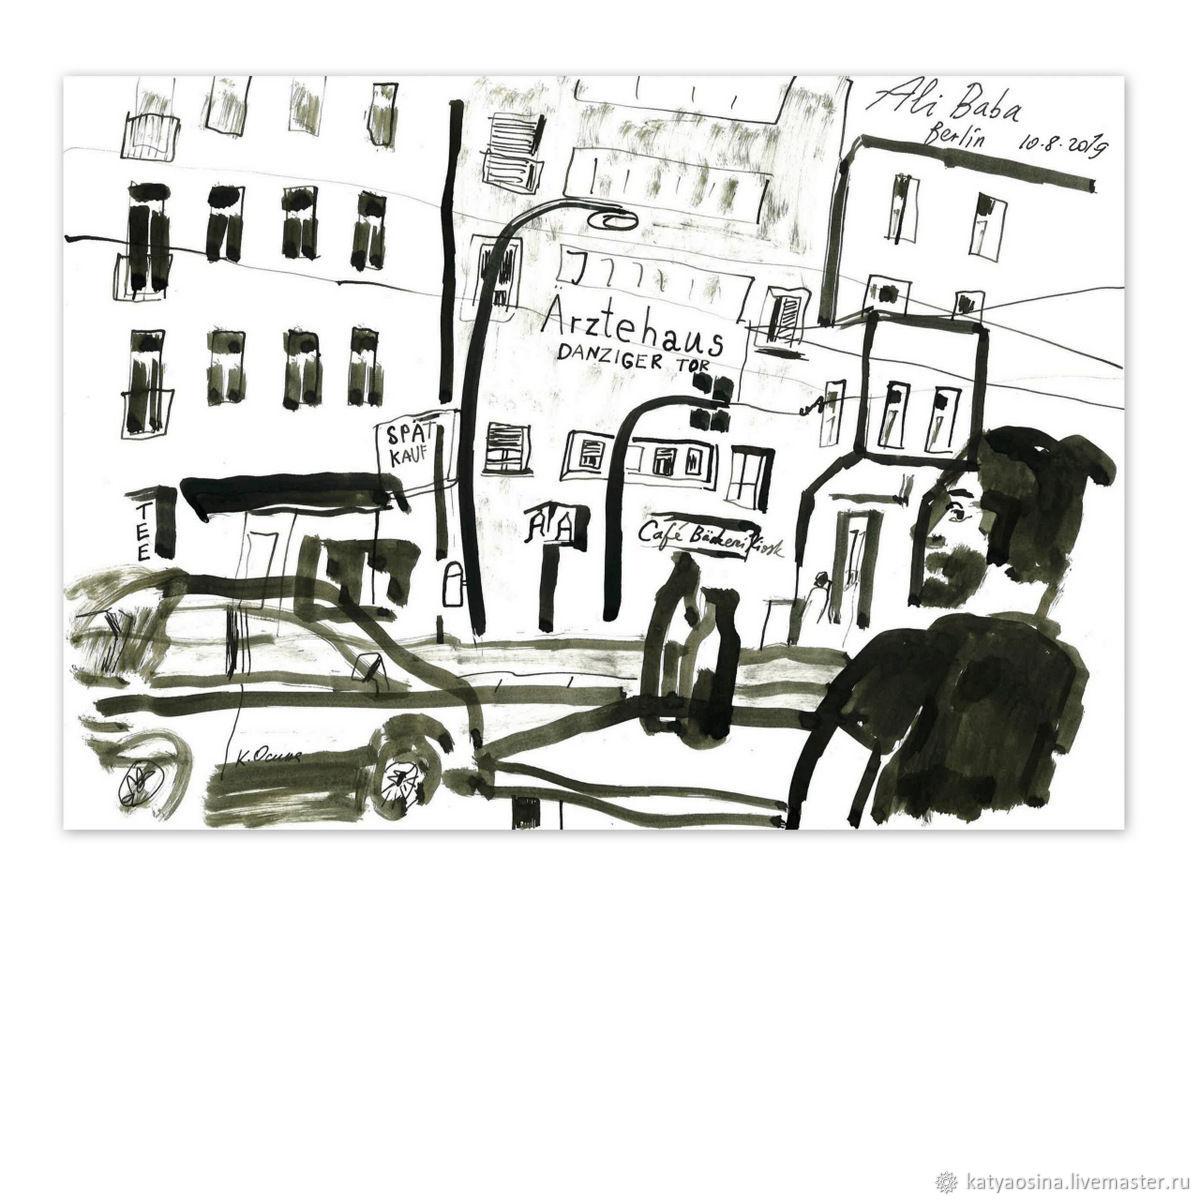 "Картина ""Вид из кафе Ali-Baba"", Картины, Москва, Фото №1"